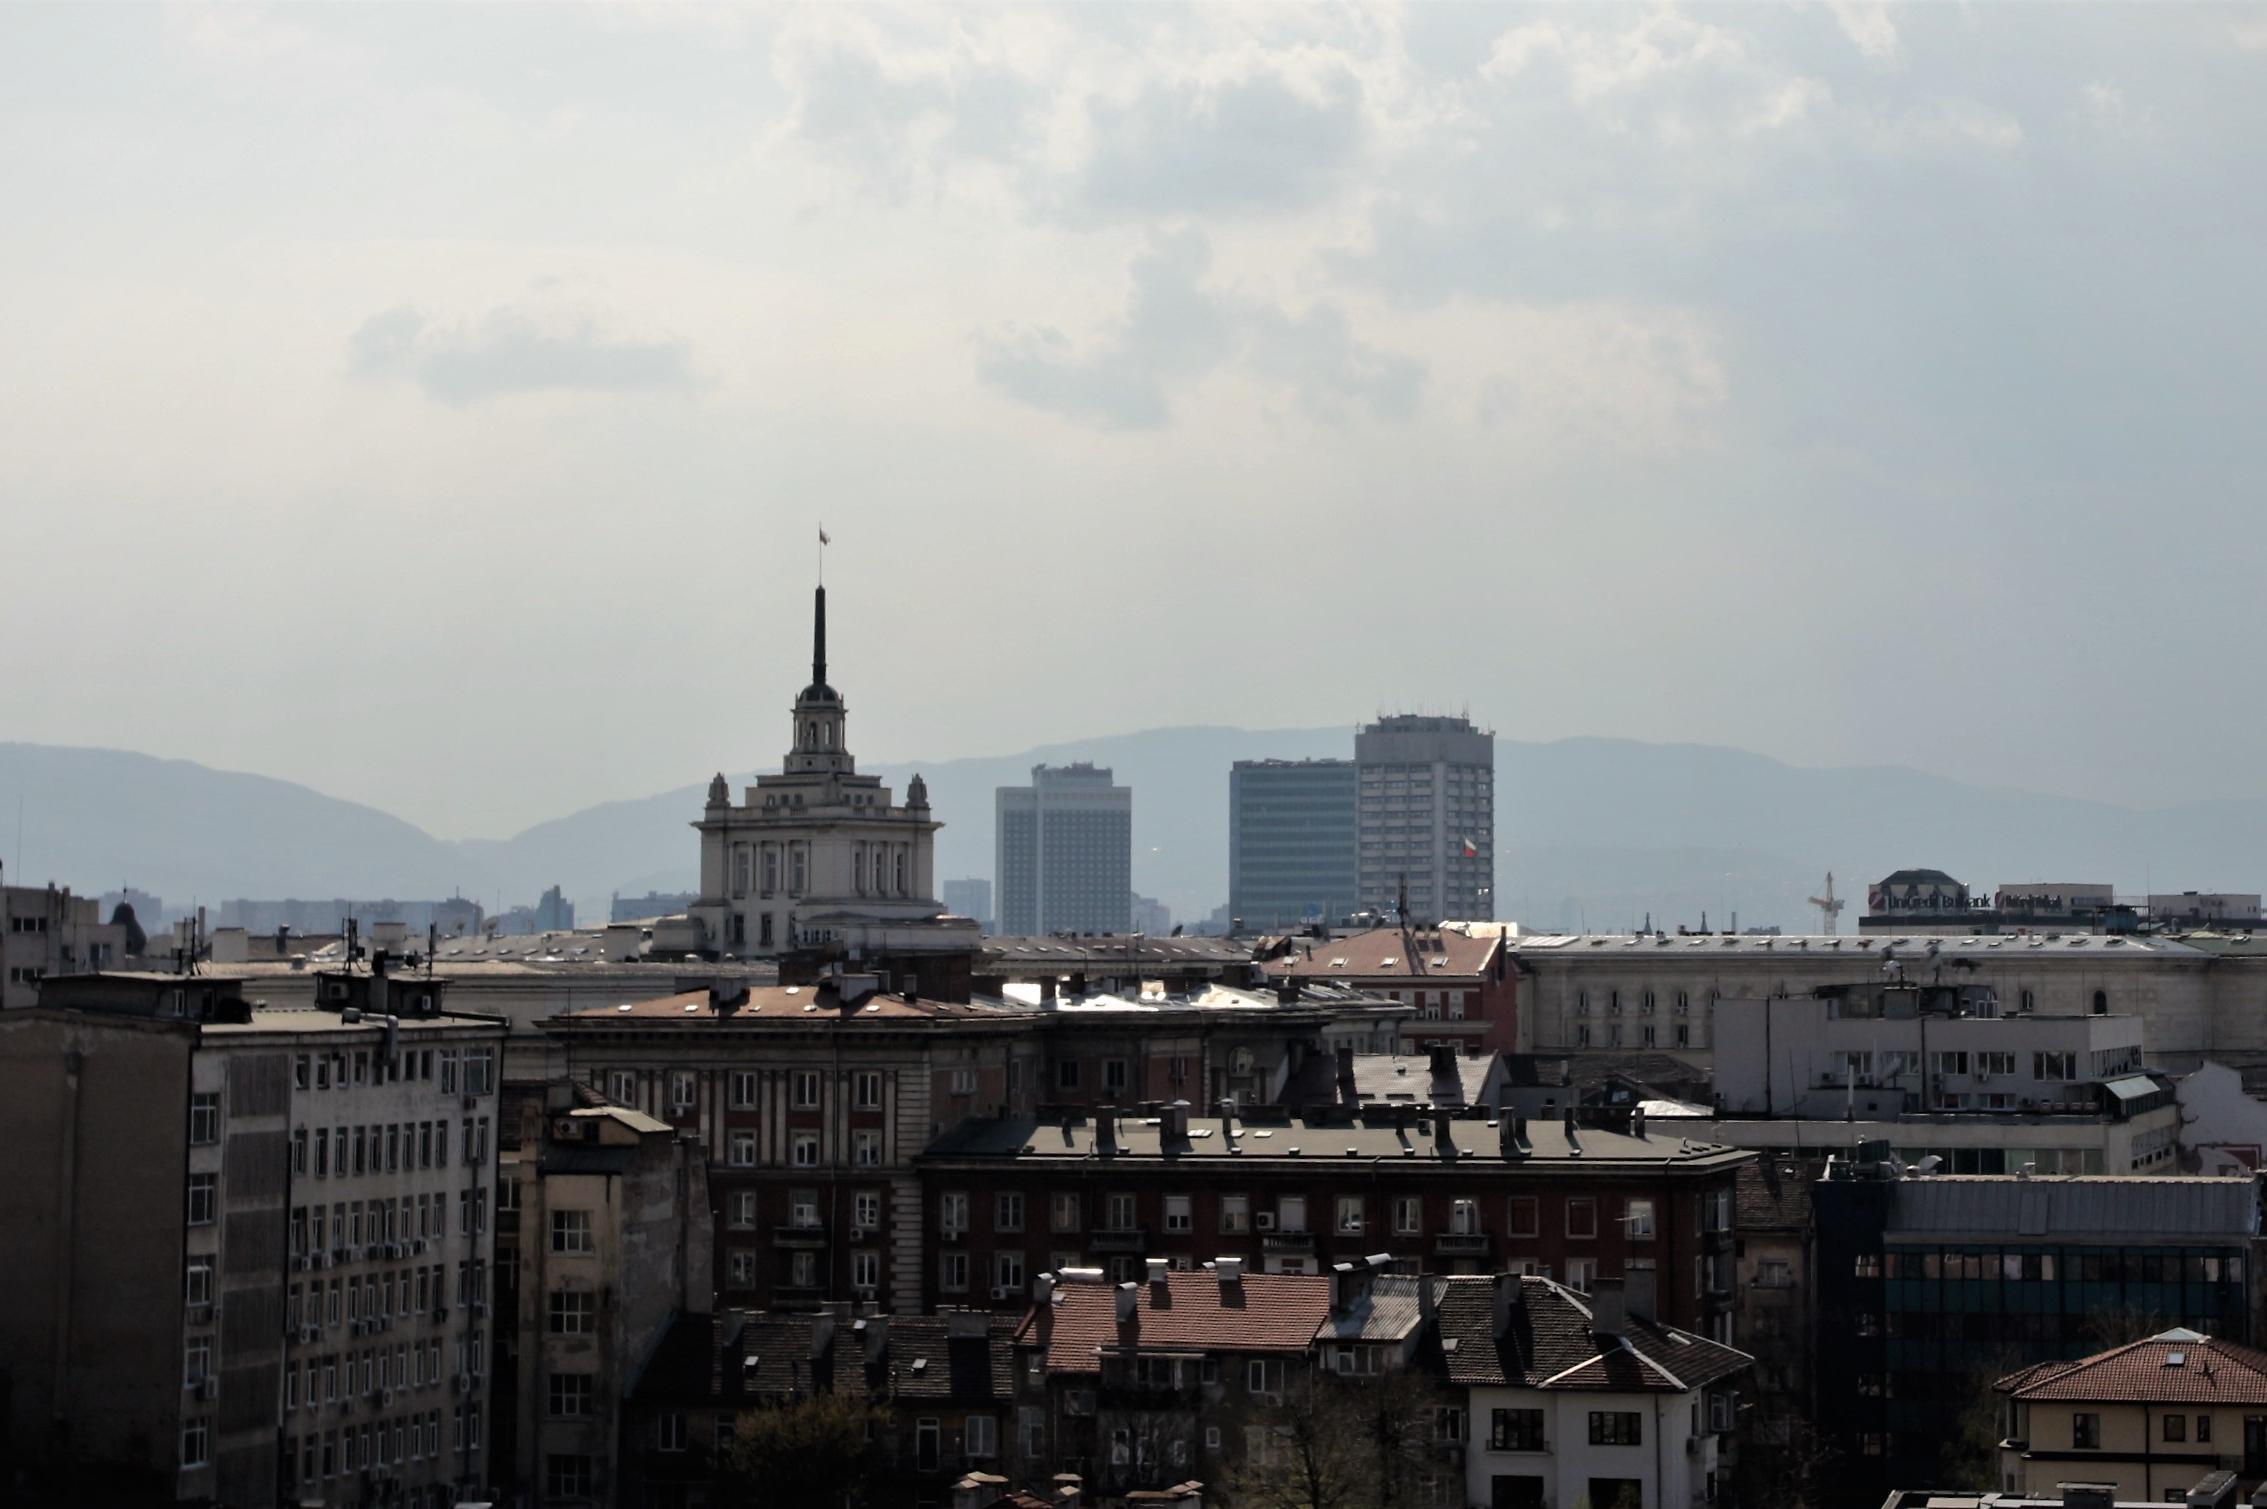 София въздух